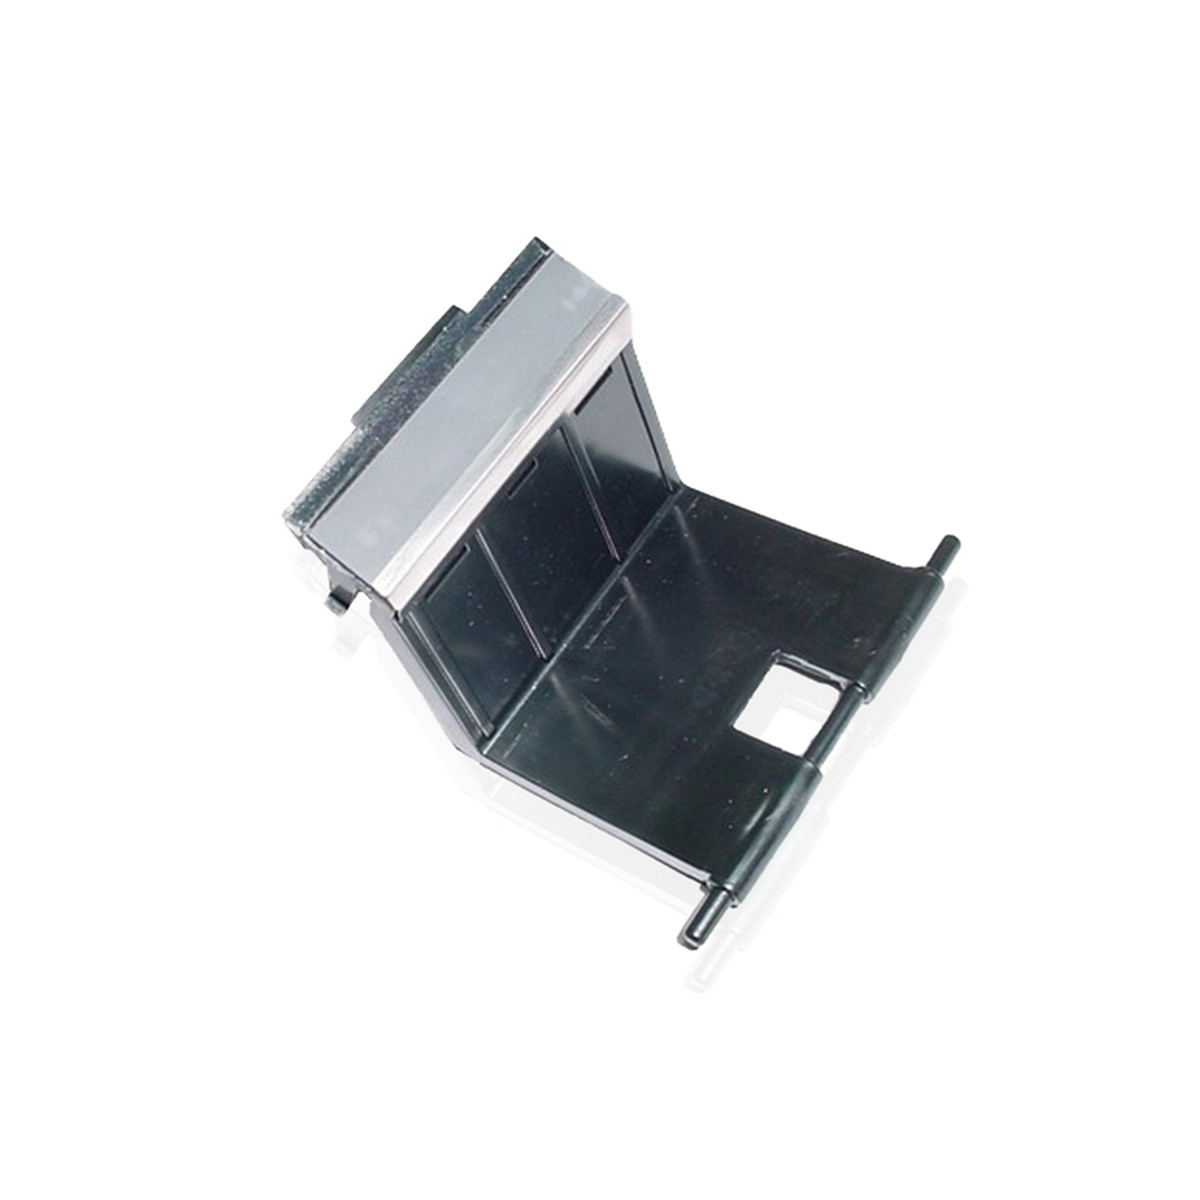 Separador de Papel Samsung SCX4200 ML1710 SCX4520 SCX4720 SCX4100 ML1510 | JC73-00140A | Compatível